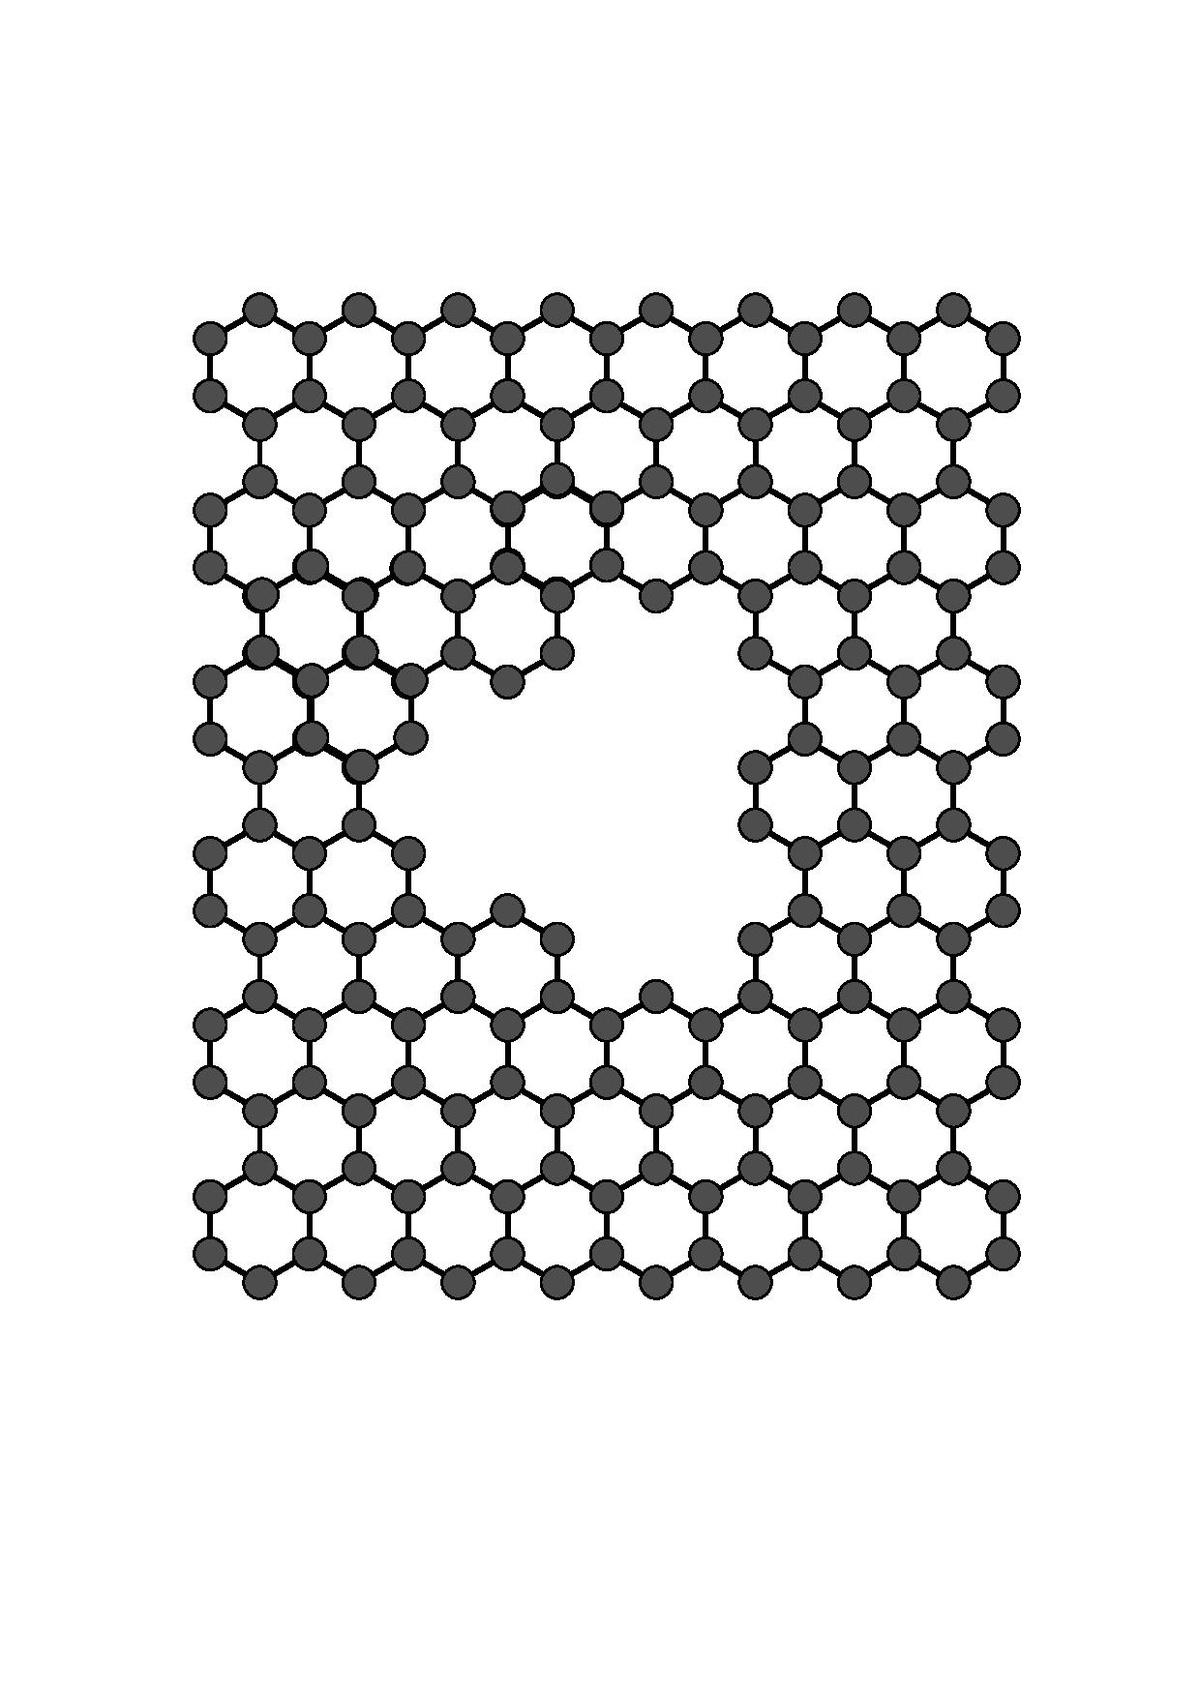 Graphene Boron Nitride Nanohybrid Materials